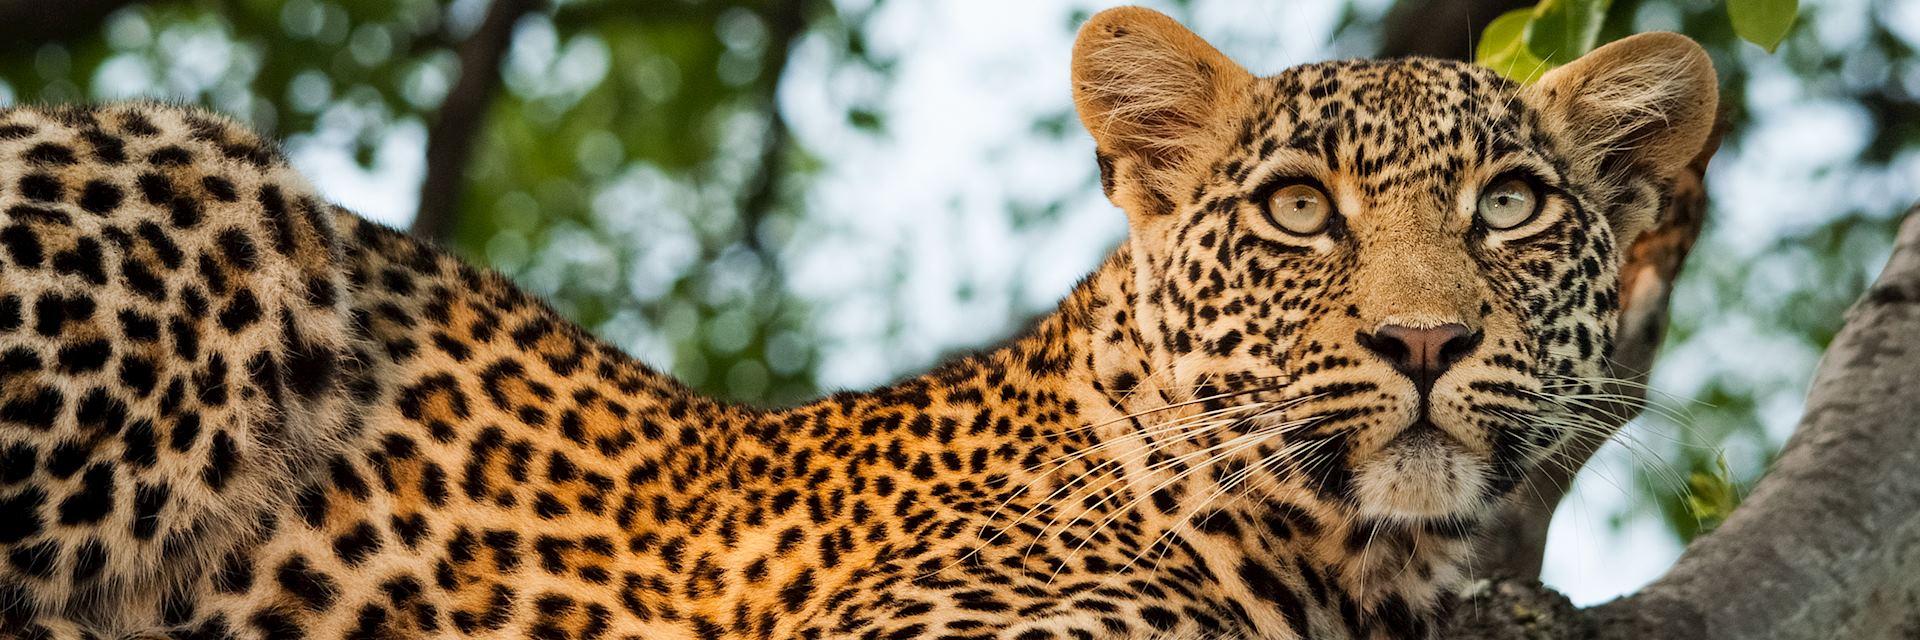 Leopard in Sabi Sands Game Reserve